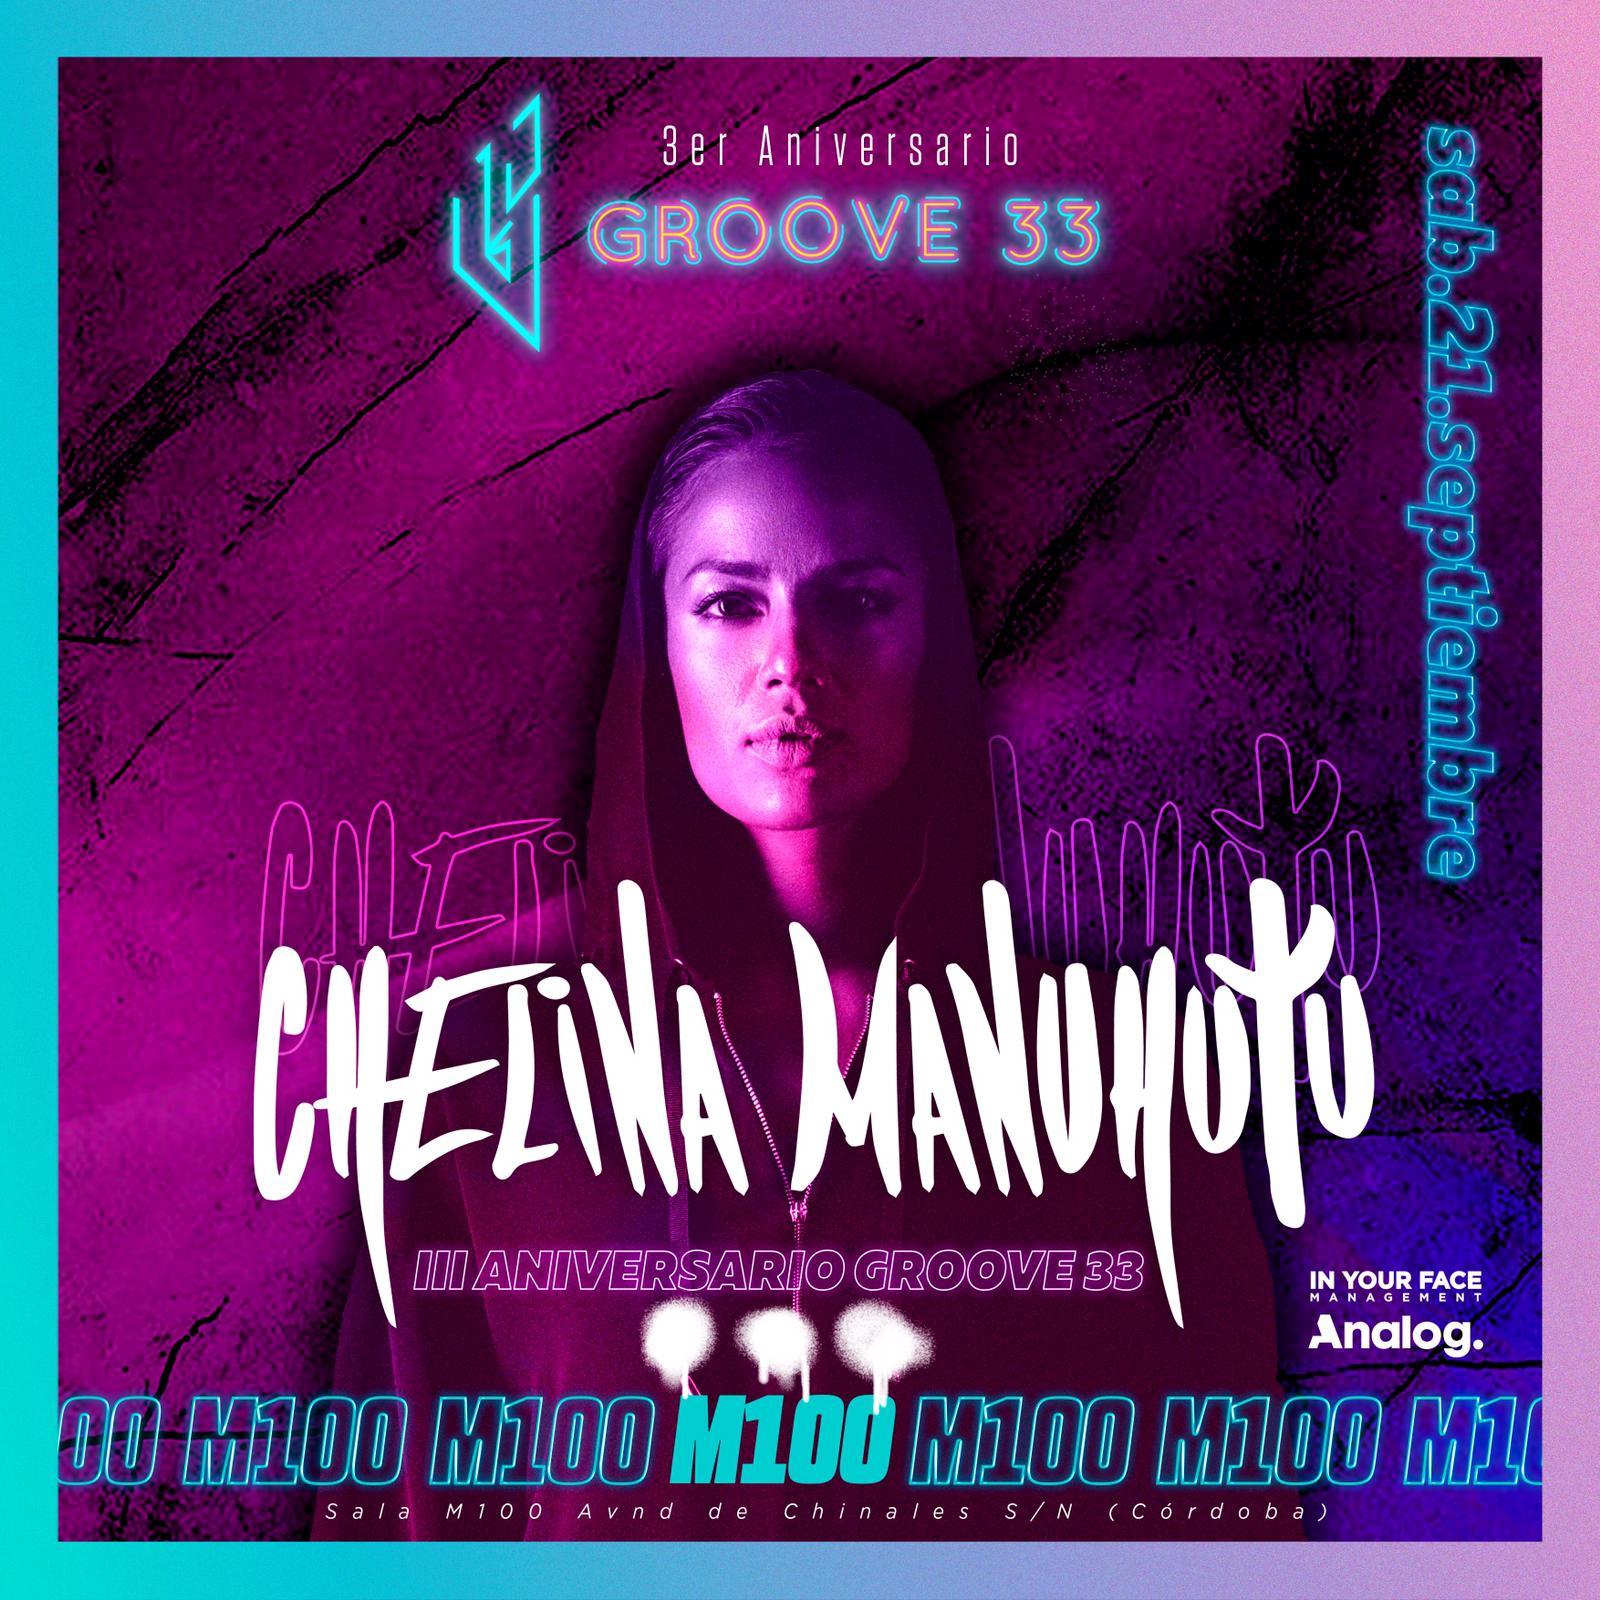 3º Aniversario Groove 33 - Chelina Manuhutu